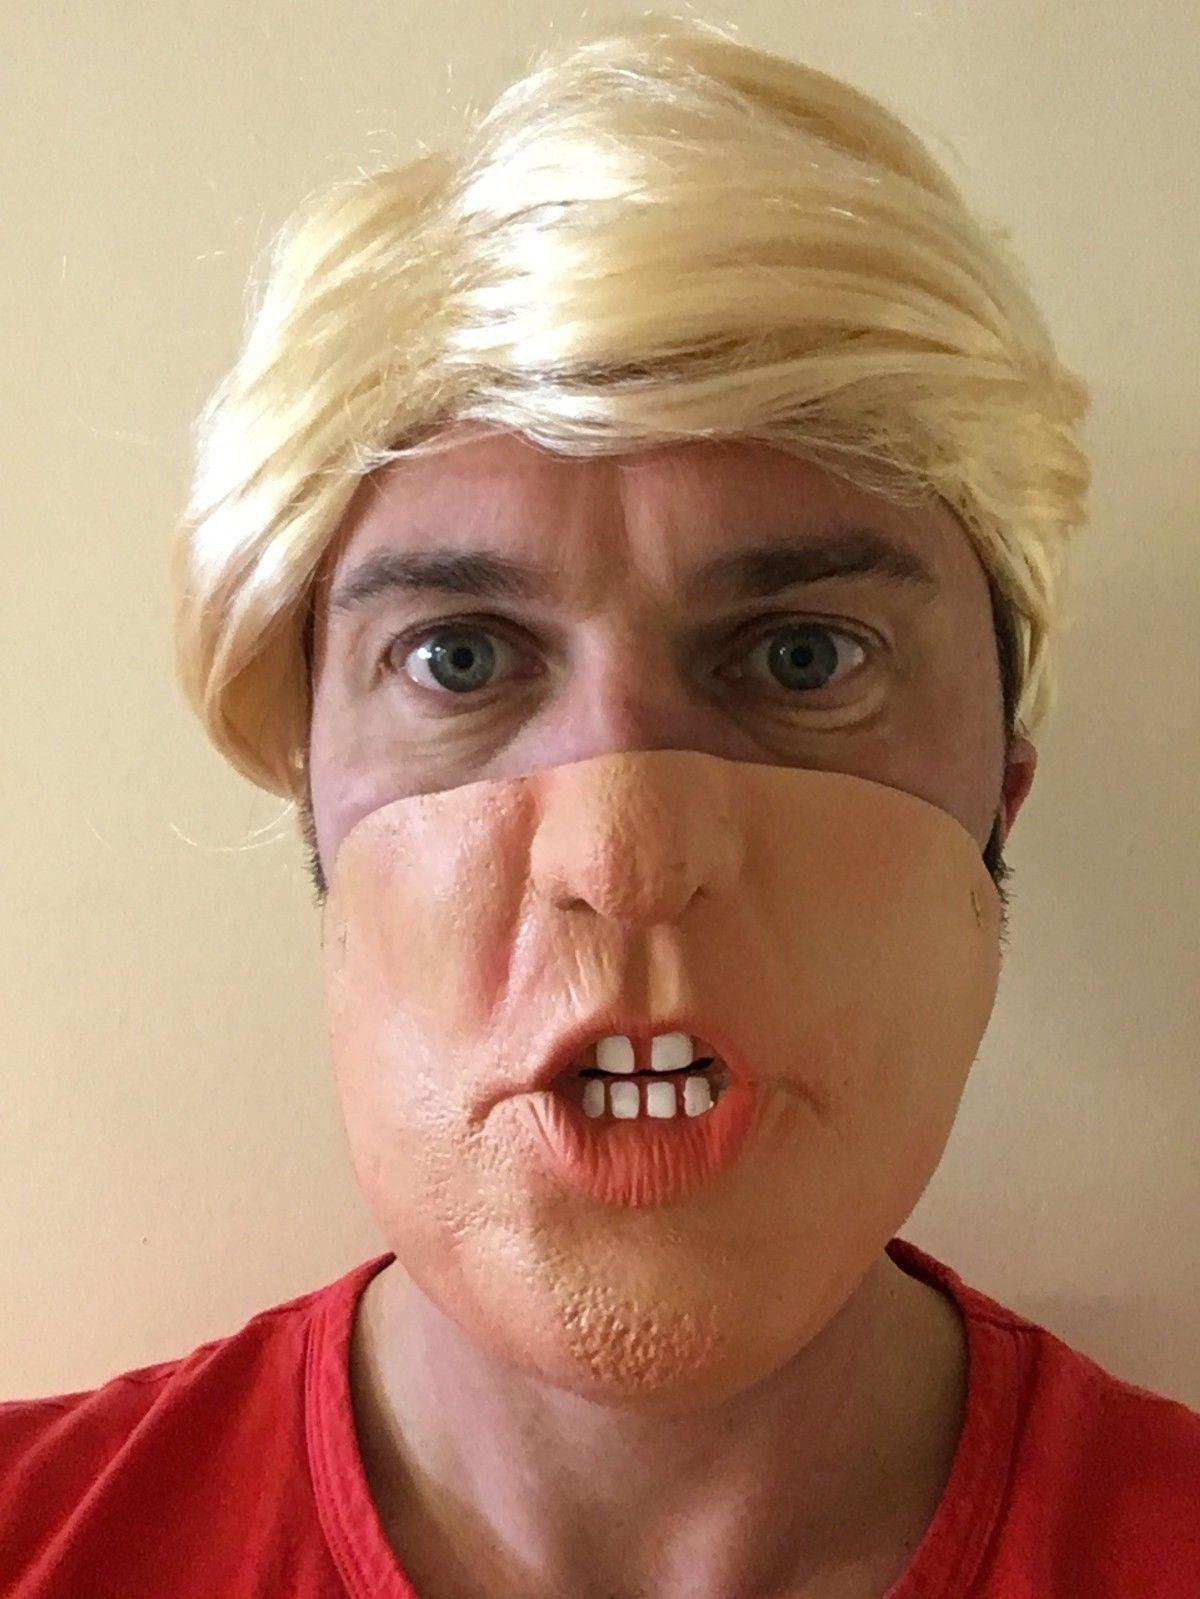 Donald Trump Mask Half Face   Blond Comb Over Wig Us President Fancy Dress   ebay  Fashion 3babcb228